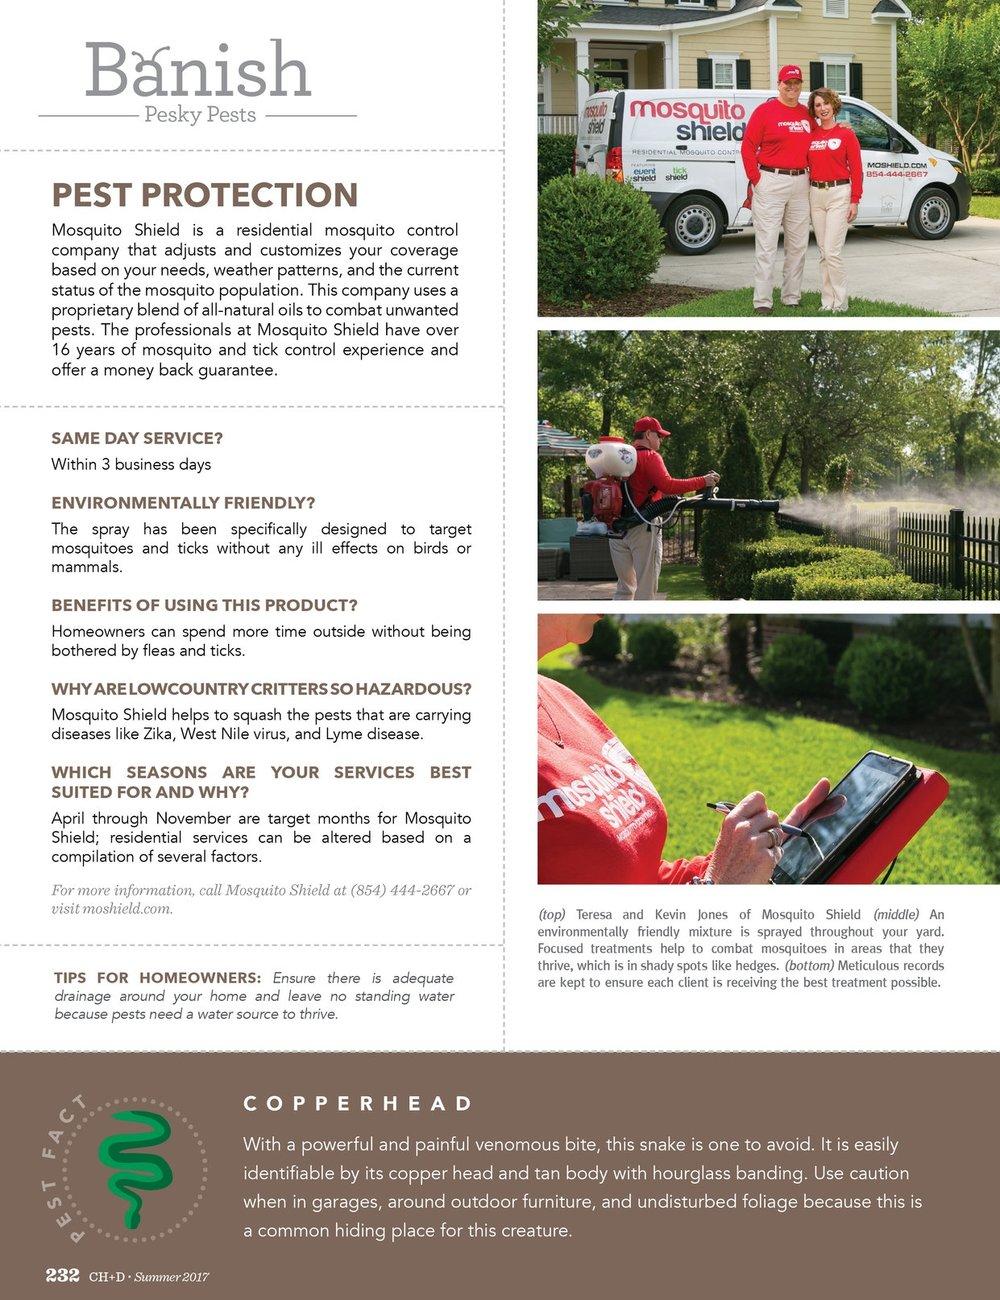 Banish Pesky Pests-3.jpg